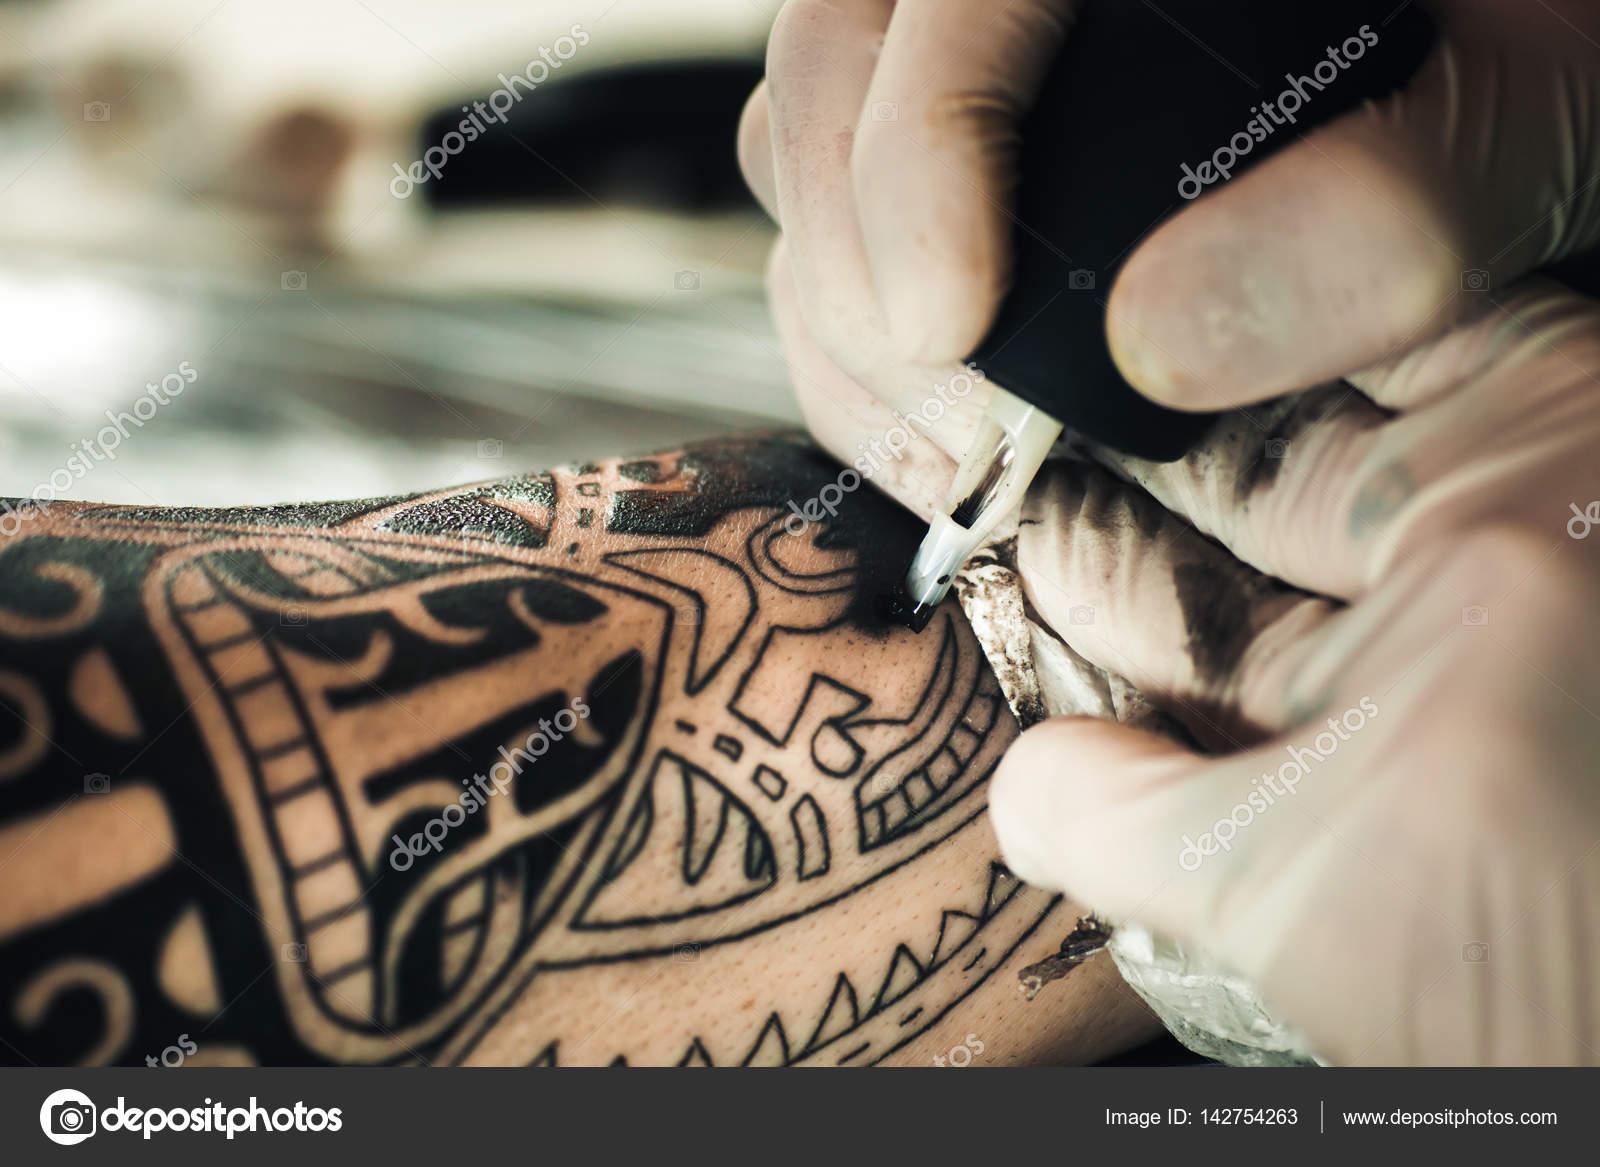 Master Tattoo Artist In Gloves Makes Tattoo On Hand Men Stock